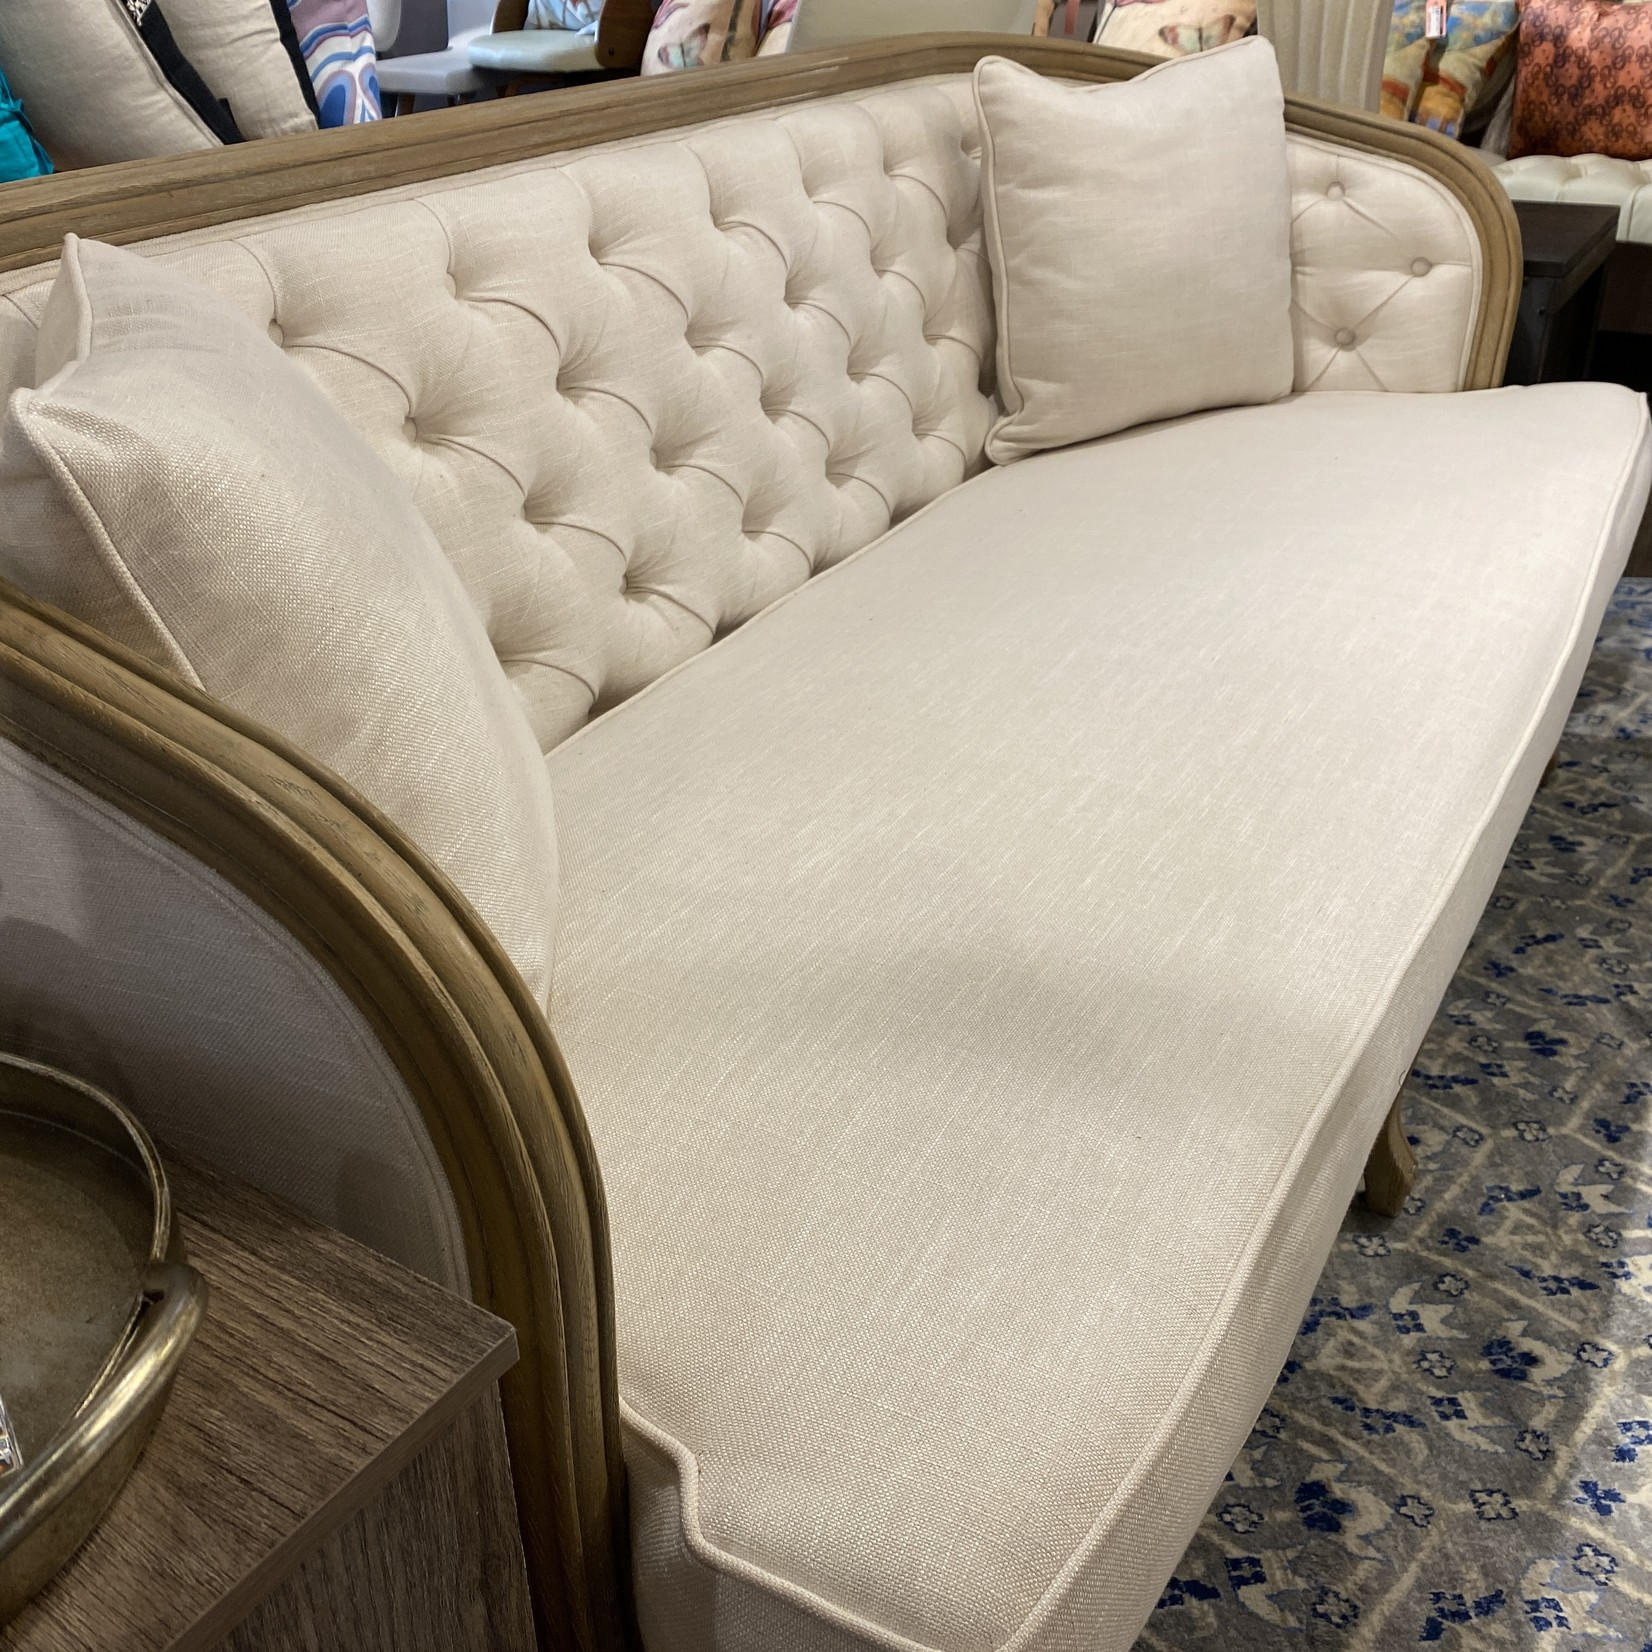 Sofa Tufted Back w/ 2 Cushions (Cream)